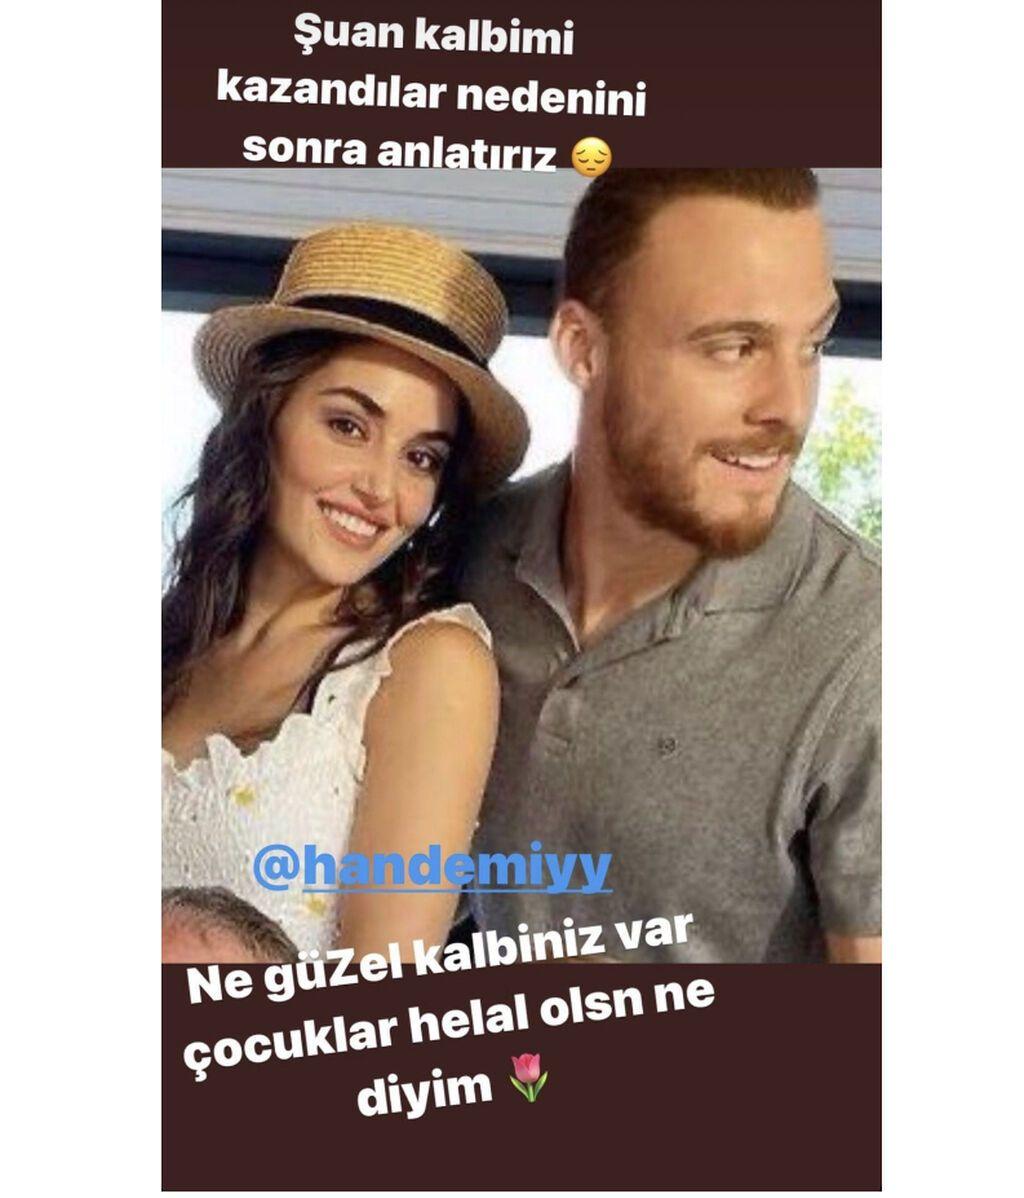 Story Demet Akalin en agradecimiento a Hande y Kerem